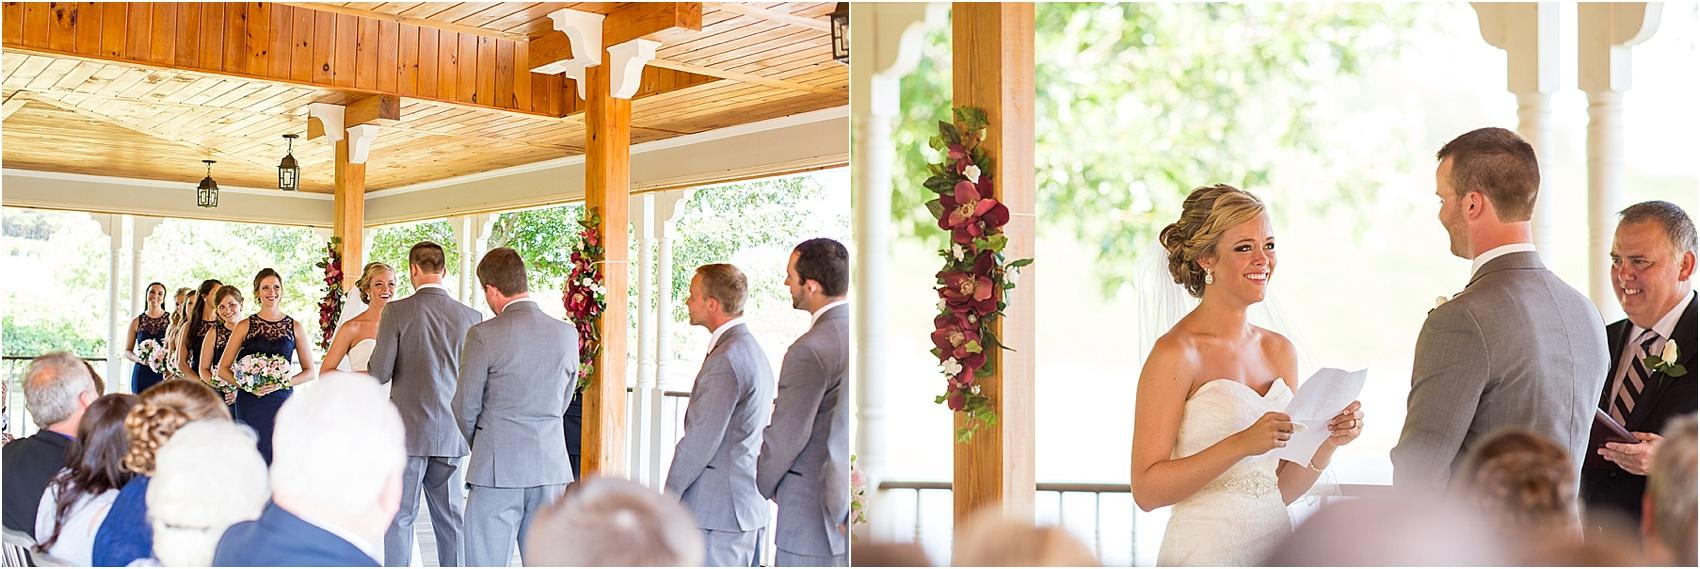 Brock Wedding Highlights- Frogtown-48_WEB.jpg